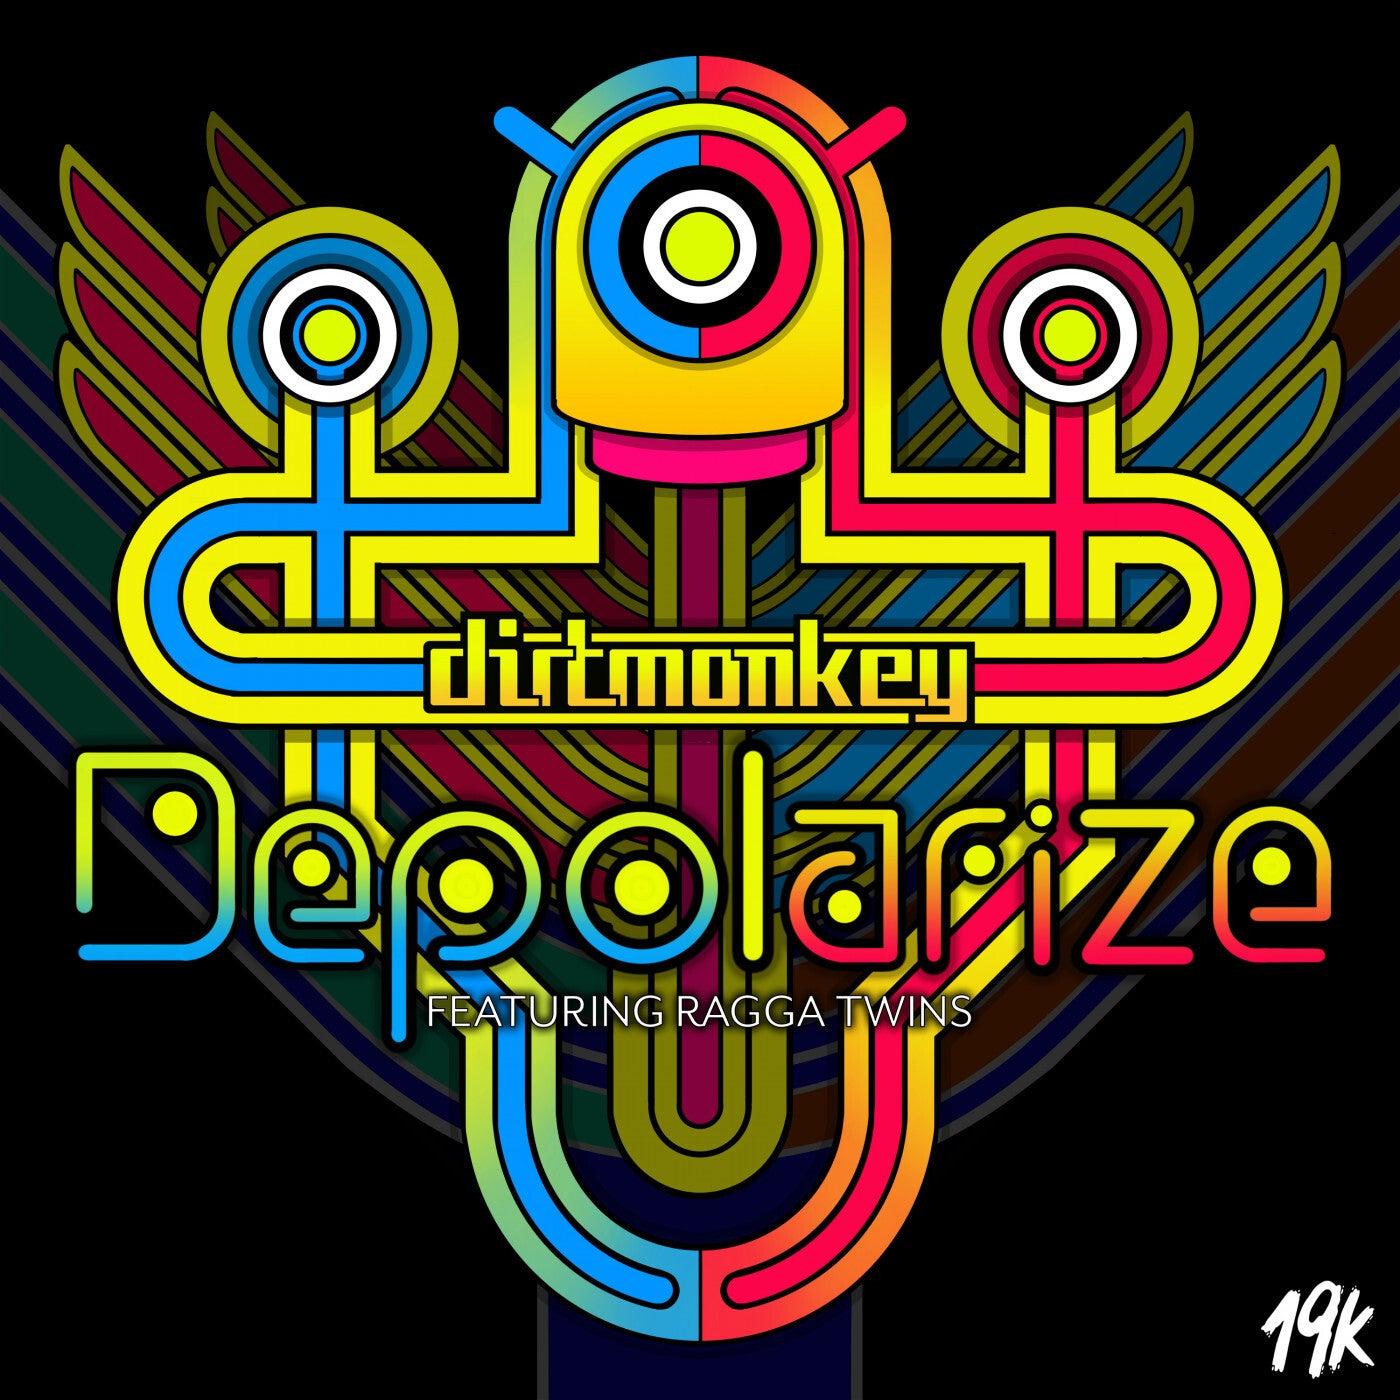 Depolarize feat. Ragga Twins (Original Mix)